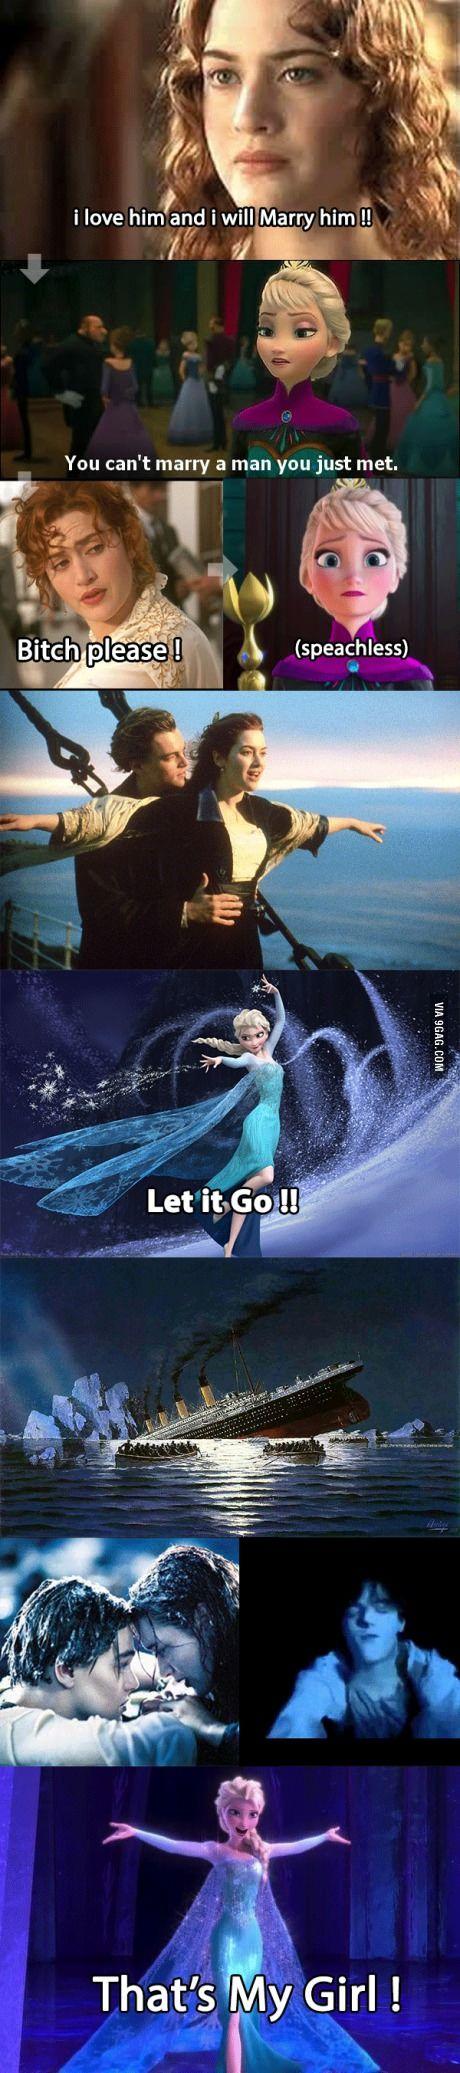 Frozen Titanic (she let him go)